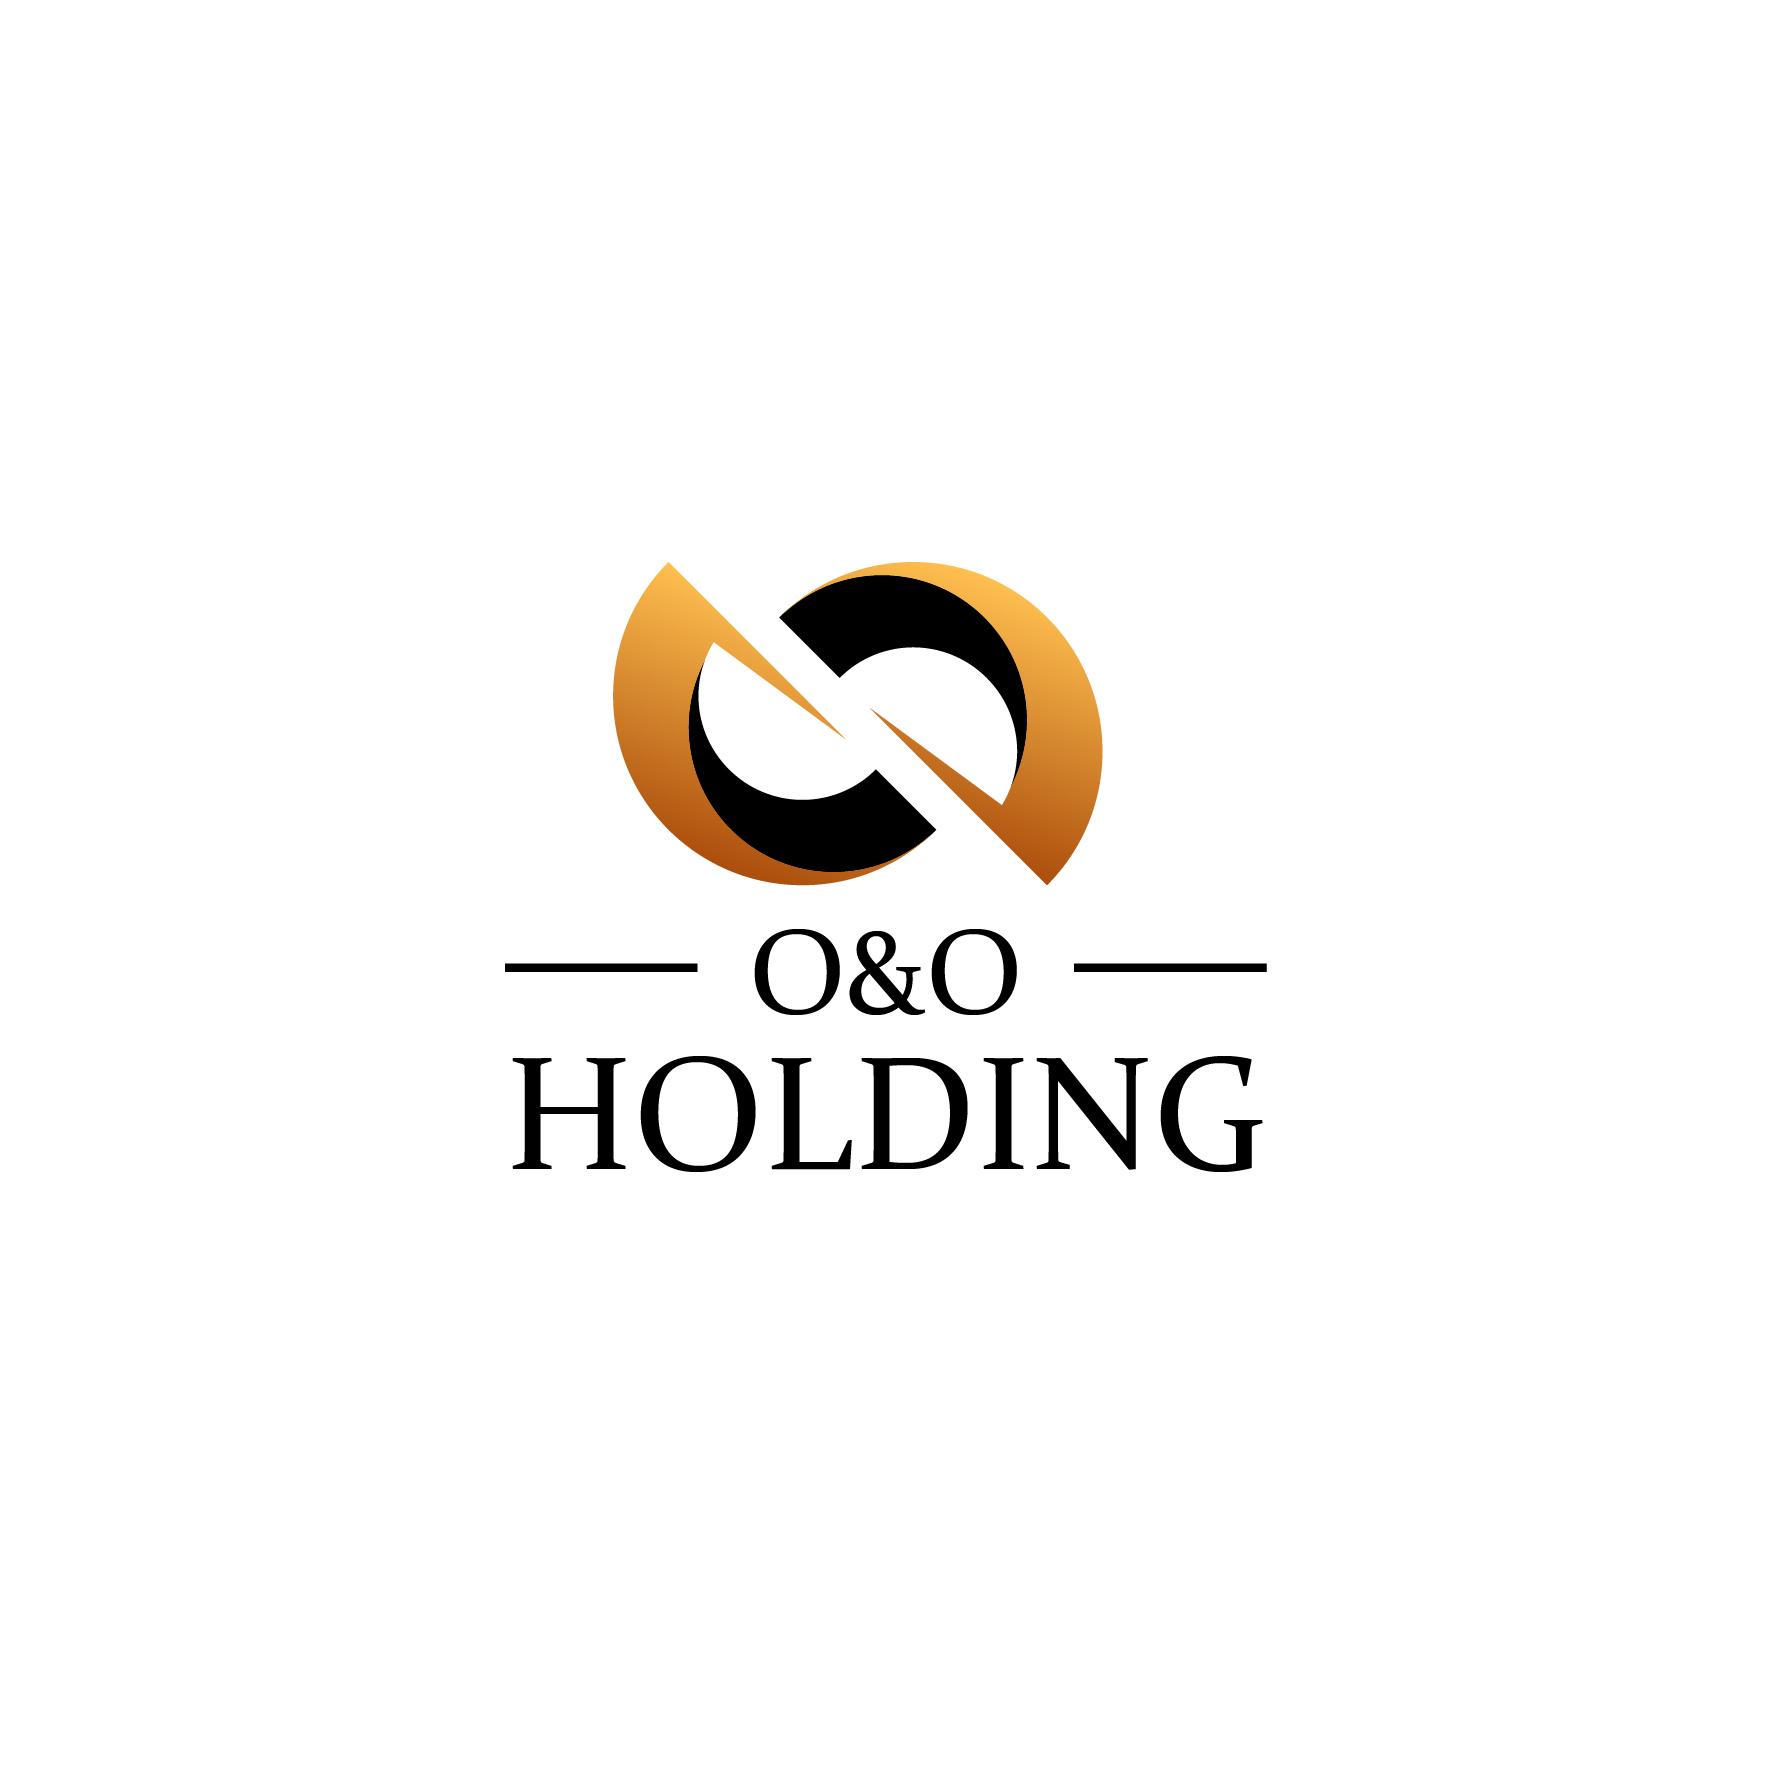 "Разработка Логотипа +  Фирменного знака для компании ""O & O HOLDING"" фото f_1075c7b0449c65cc.jpg"